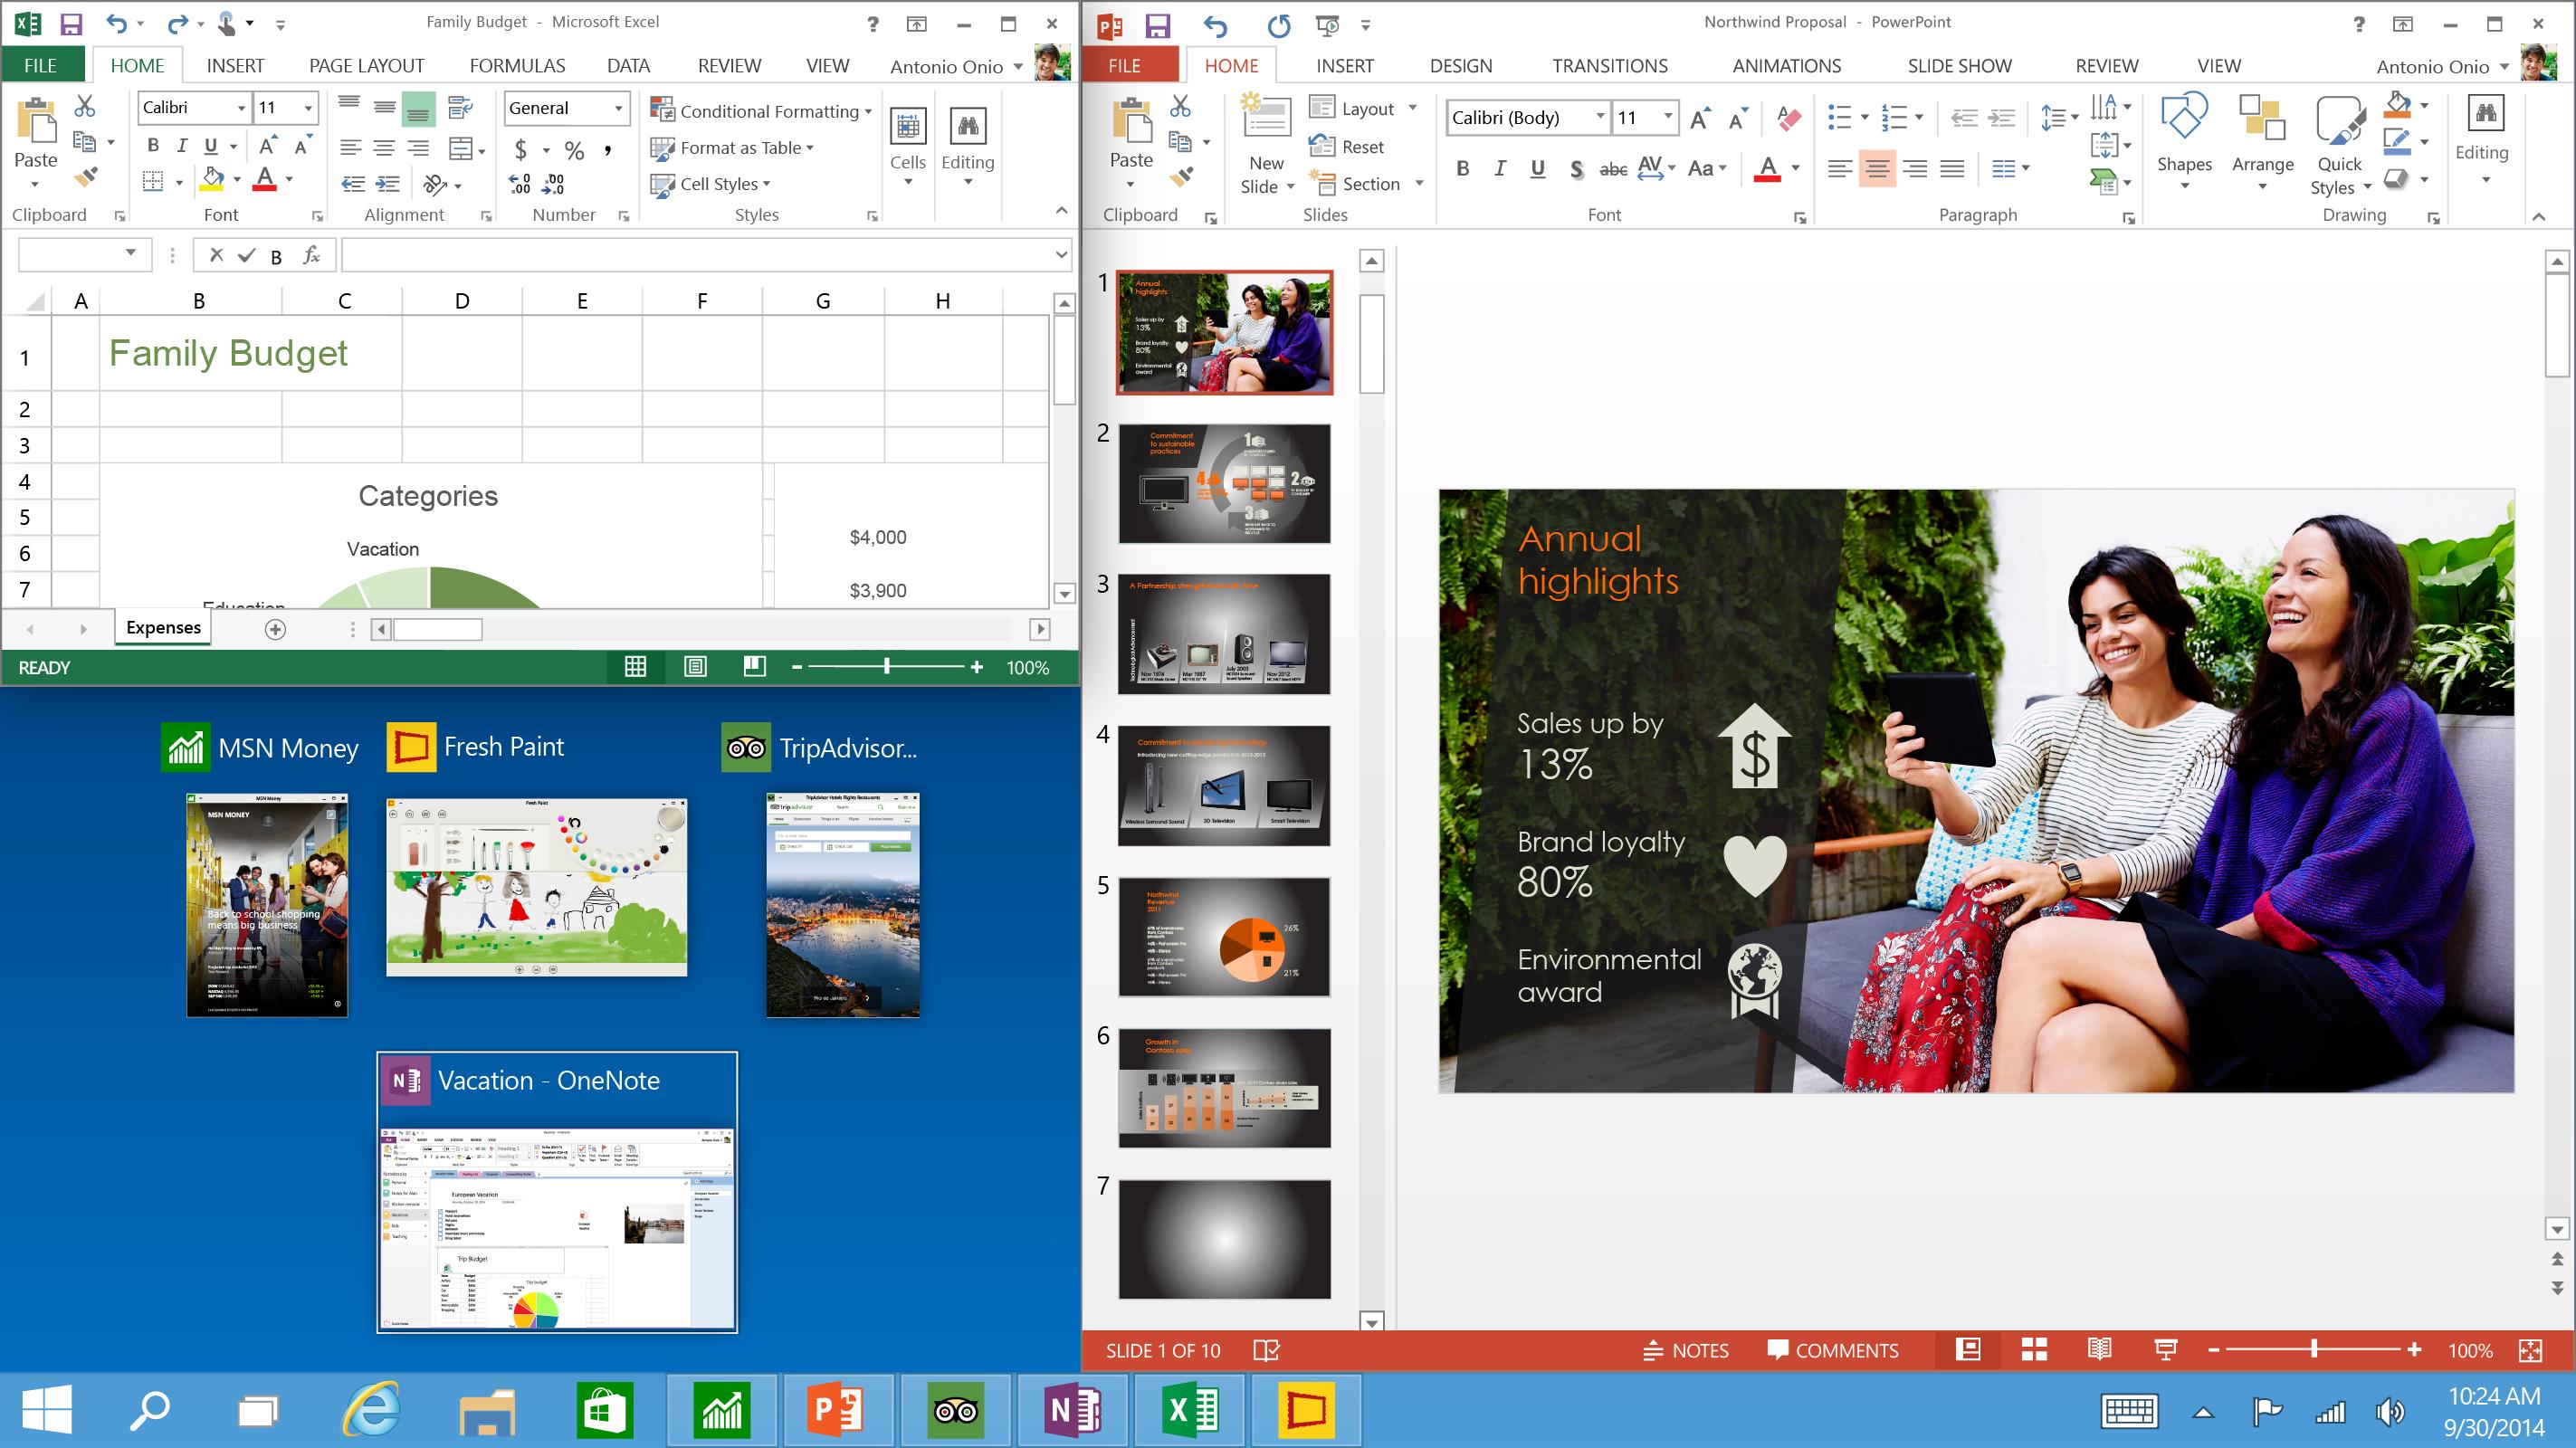 Microsofts neues Betriebssystem: Auf Windows 8 folgt Windows 10 mit Startmenü -